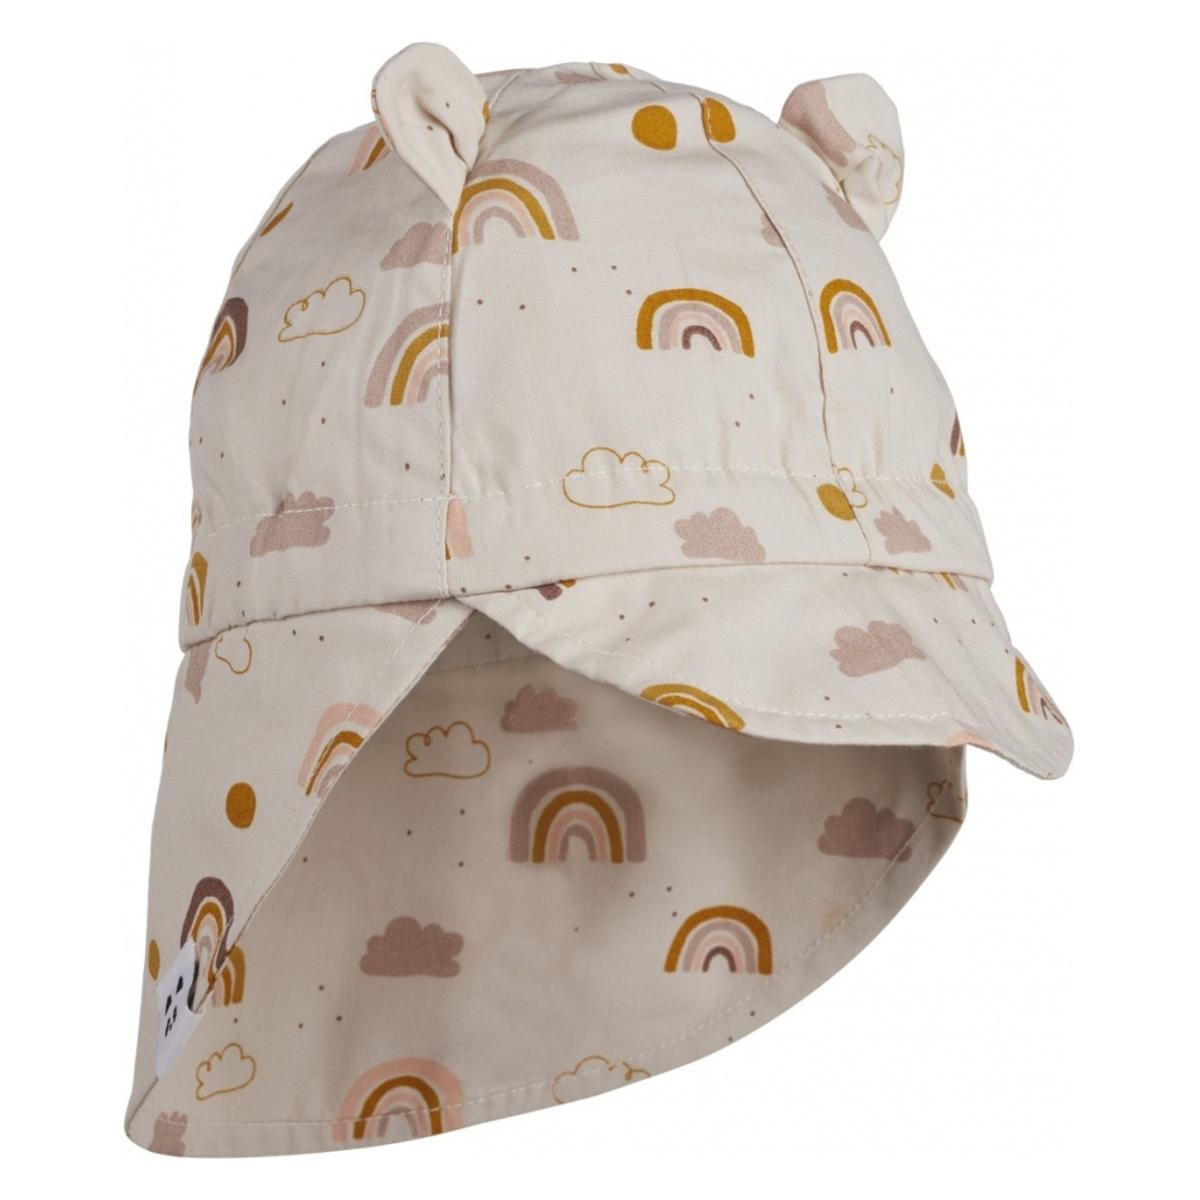 Accessoires bébé Casquette Gorm Rainbow Love Sandy - 0/6 Mois Liewood - AR202001210063